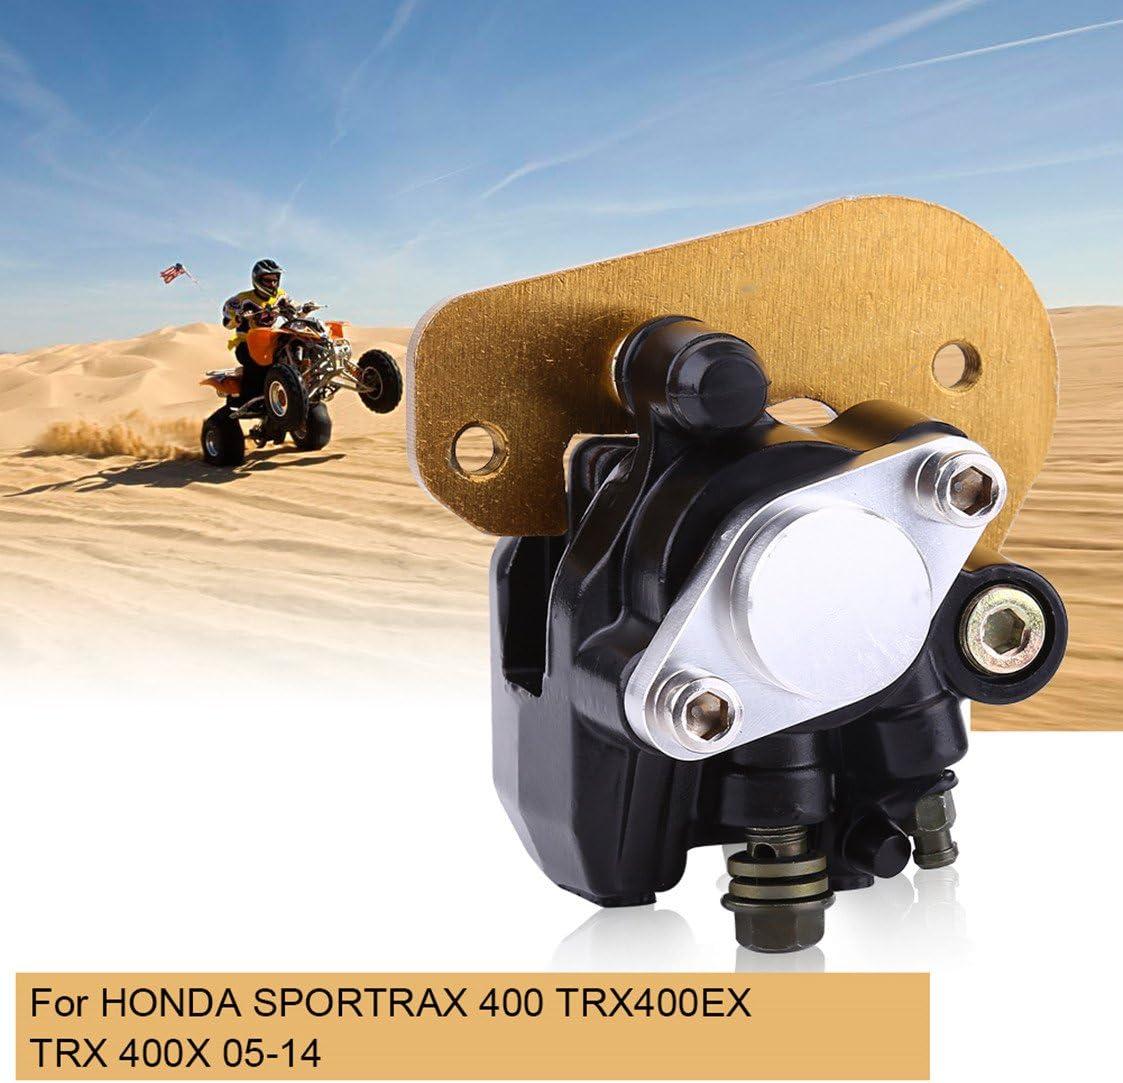 ATV trasera Pinza de freno para Honda Sportrax 400 TRX 400EX ...